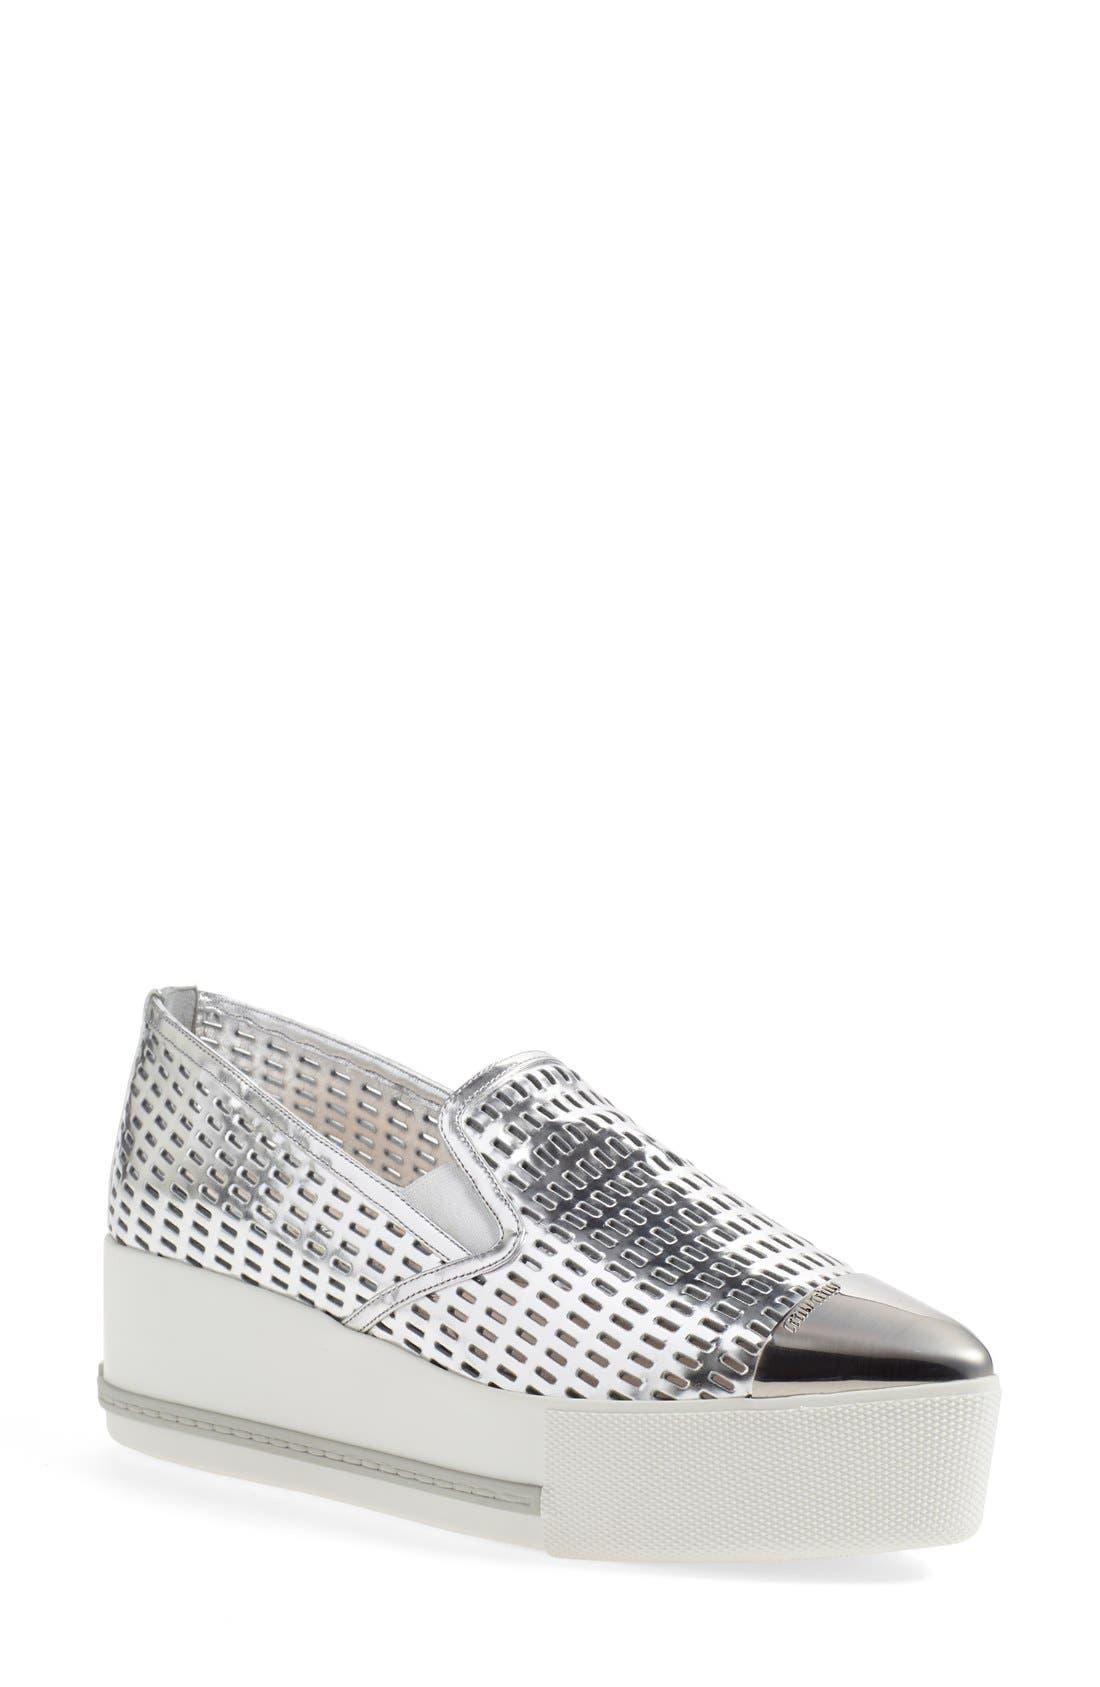 Main Image - Miu Miu 'Pantofole' Perforated Platform Sneaker (Women)